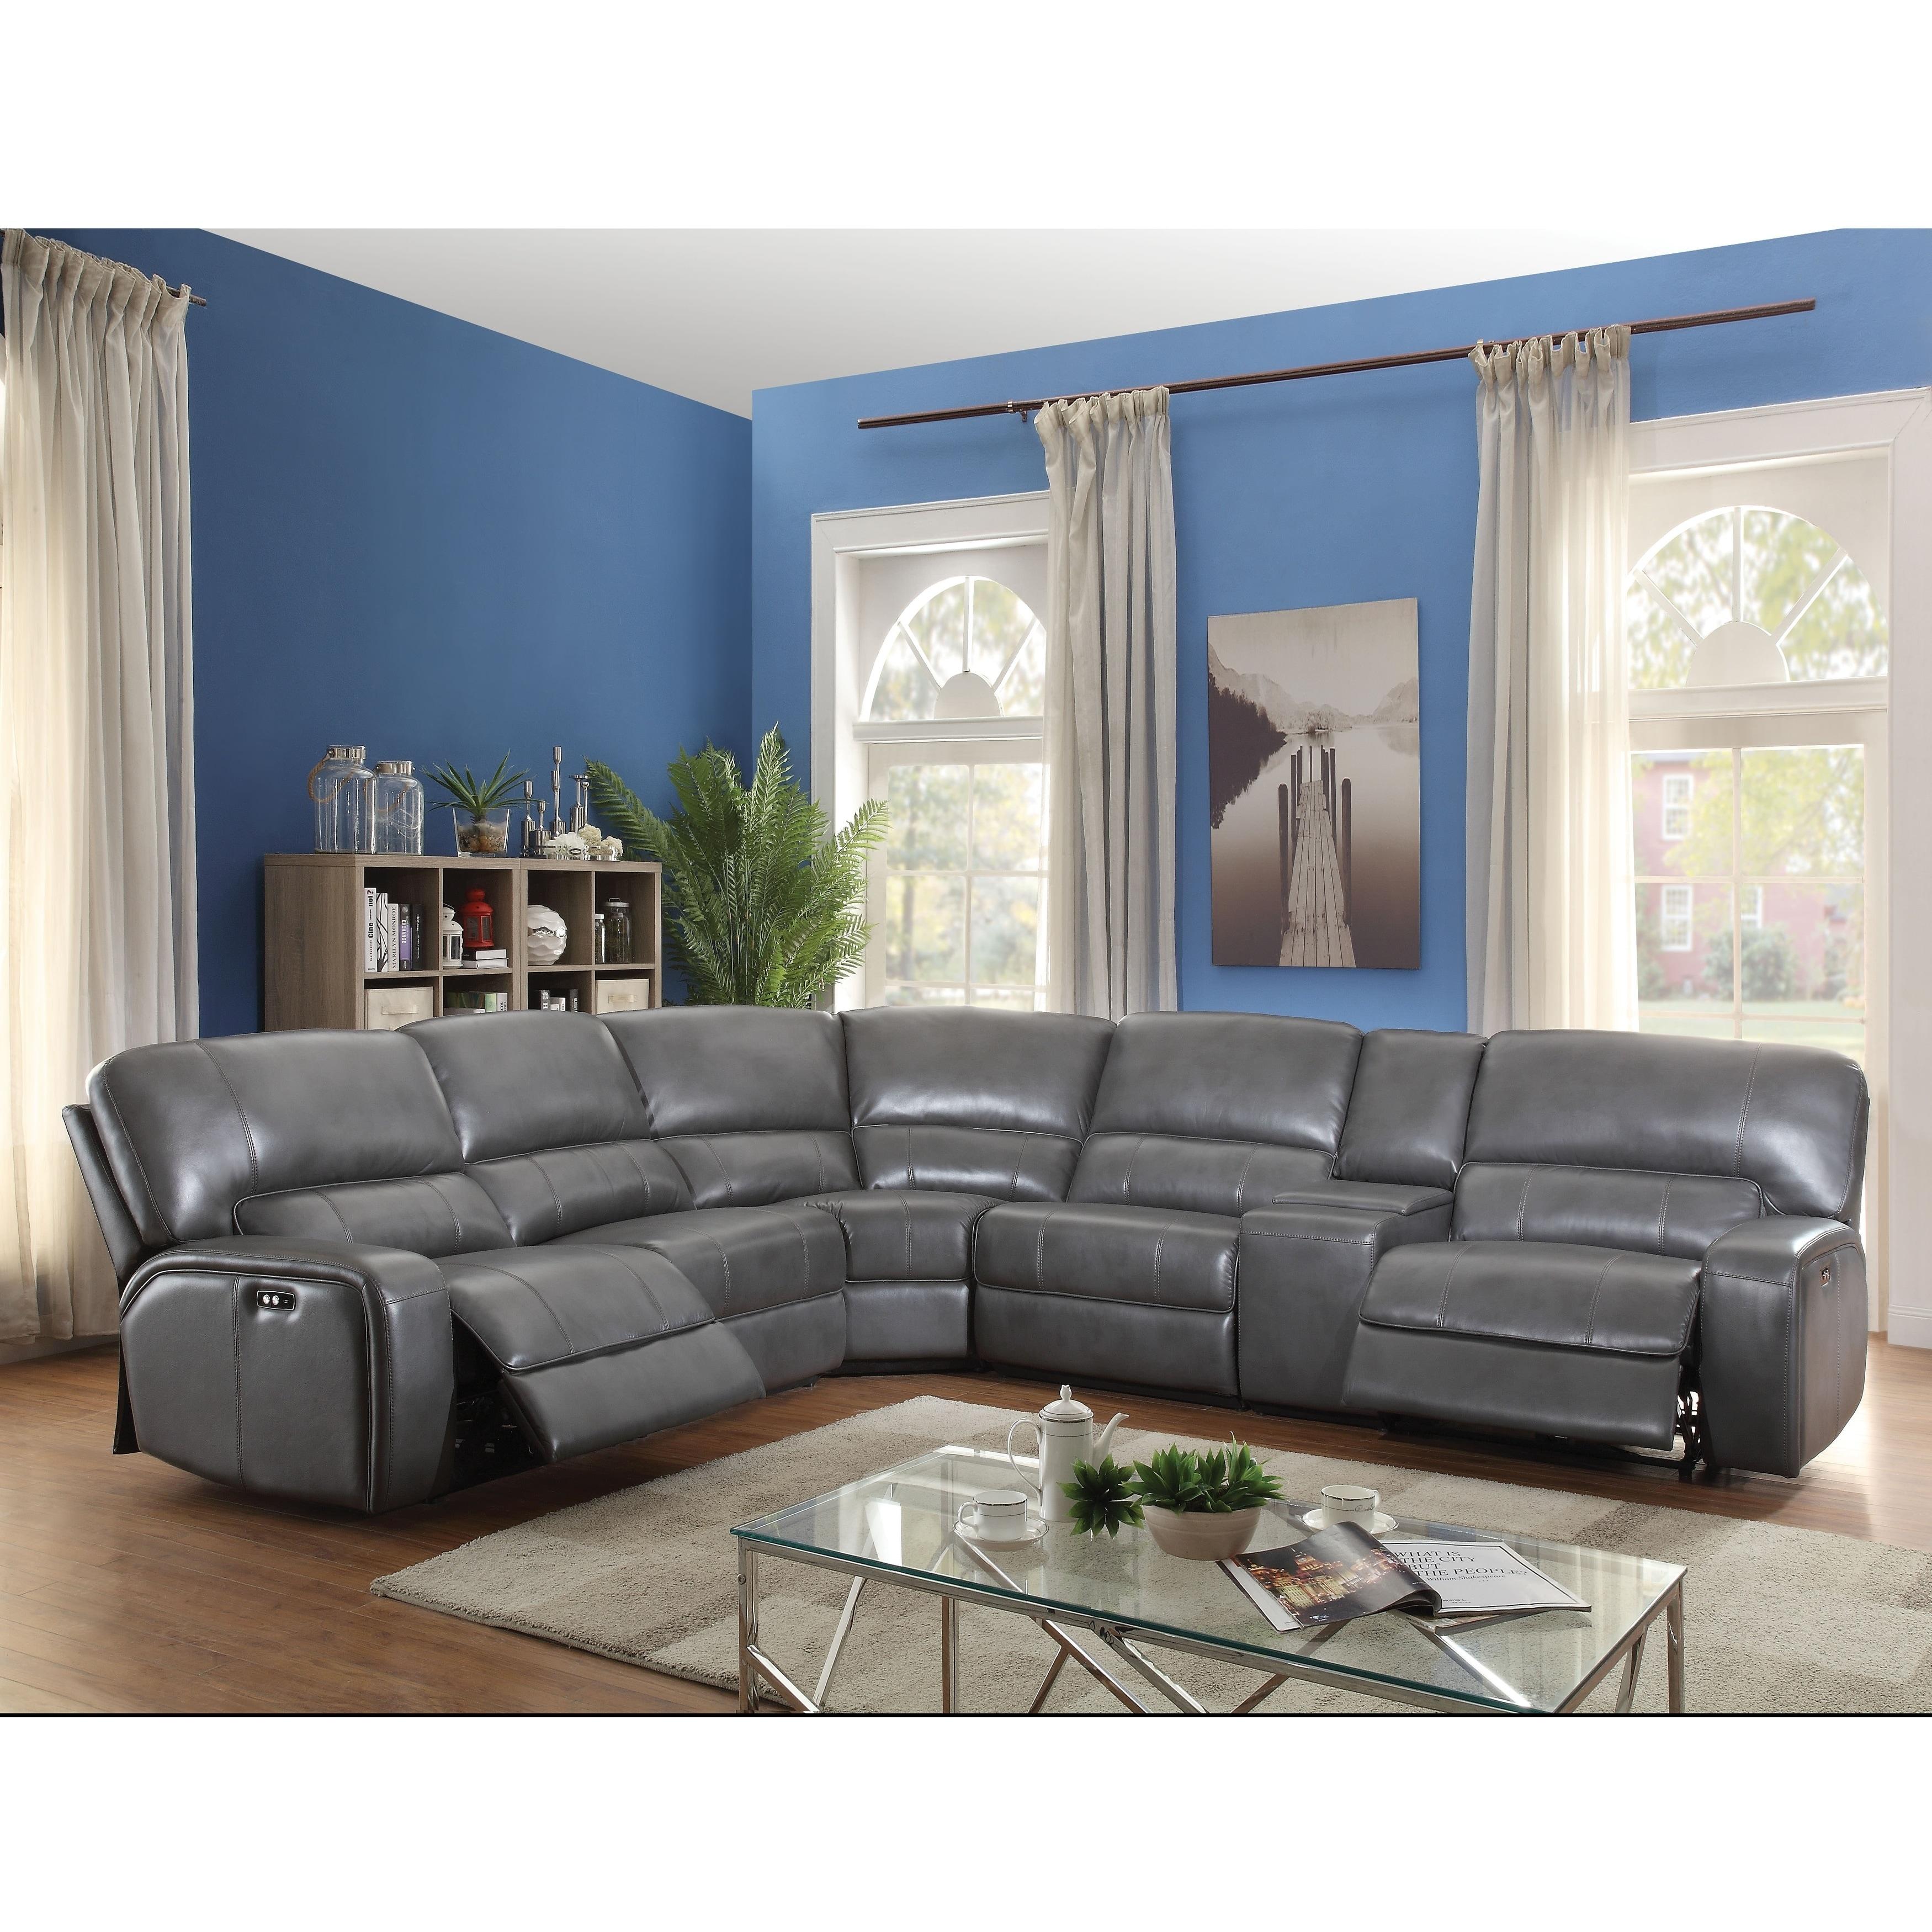 shop acme saul sectional sofa power motion usb dock gray leather rh overstock com acme furniture hilton's sectional sofa with sleeper acme saul sectional sofa